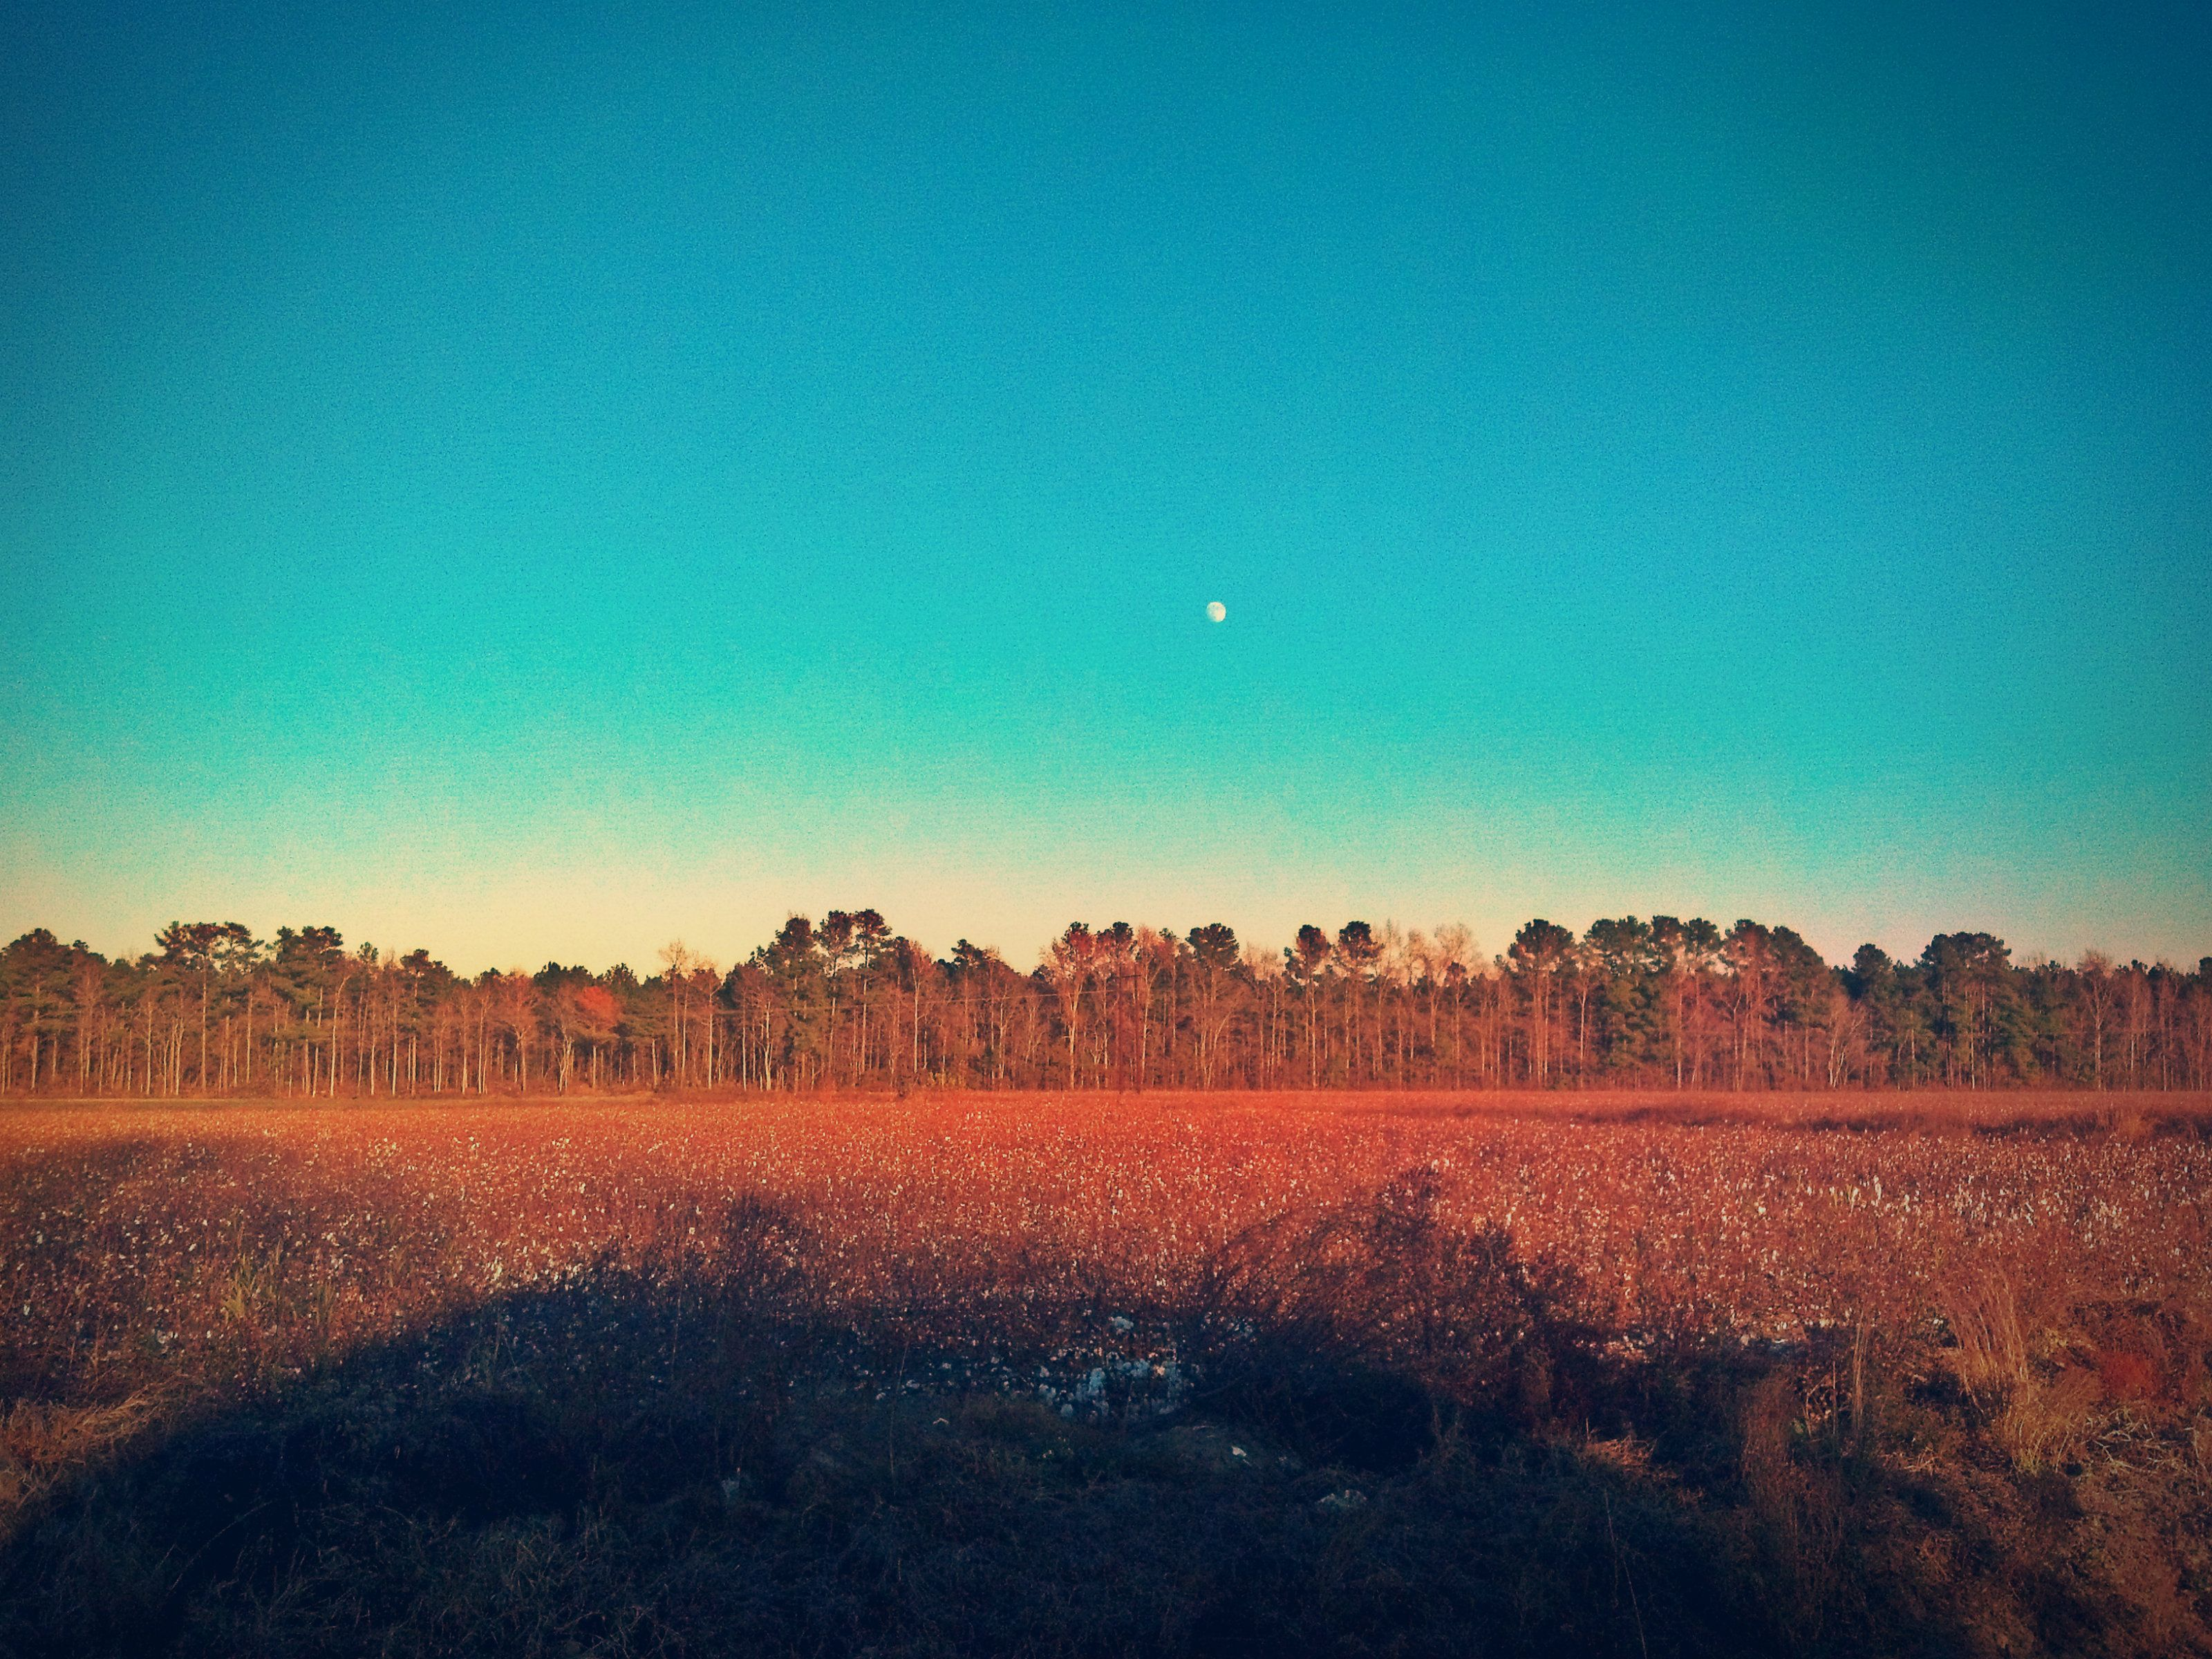 North carolina lumberton robeson county saddletree country